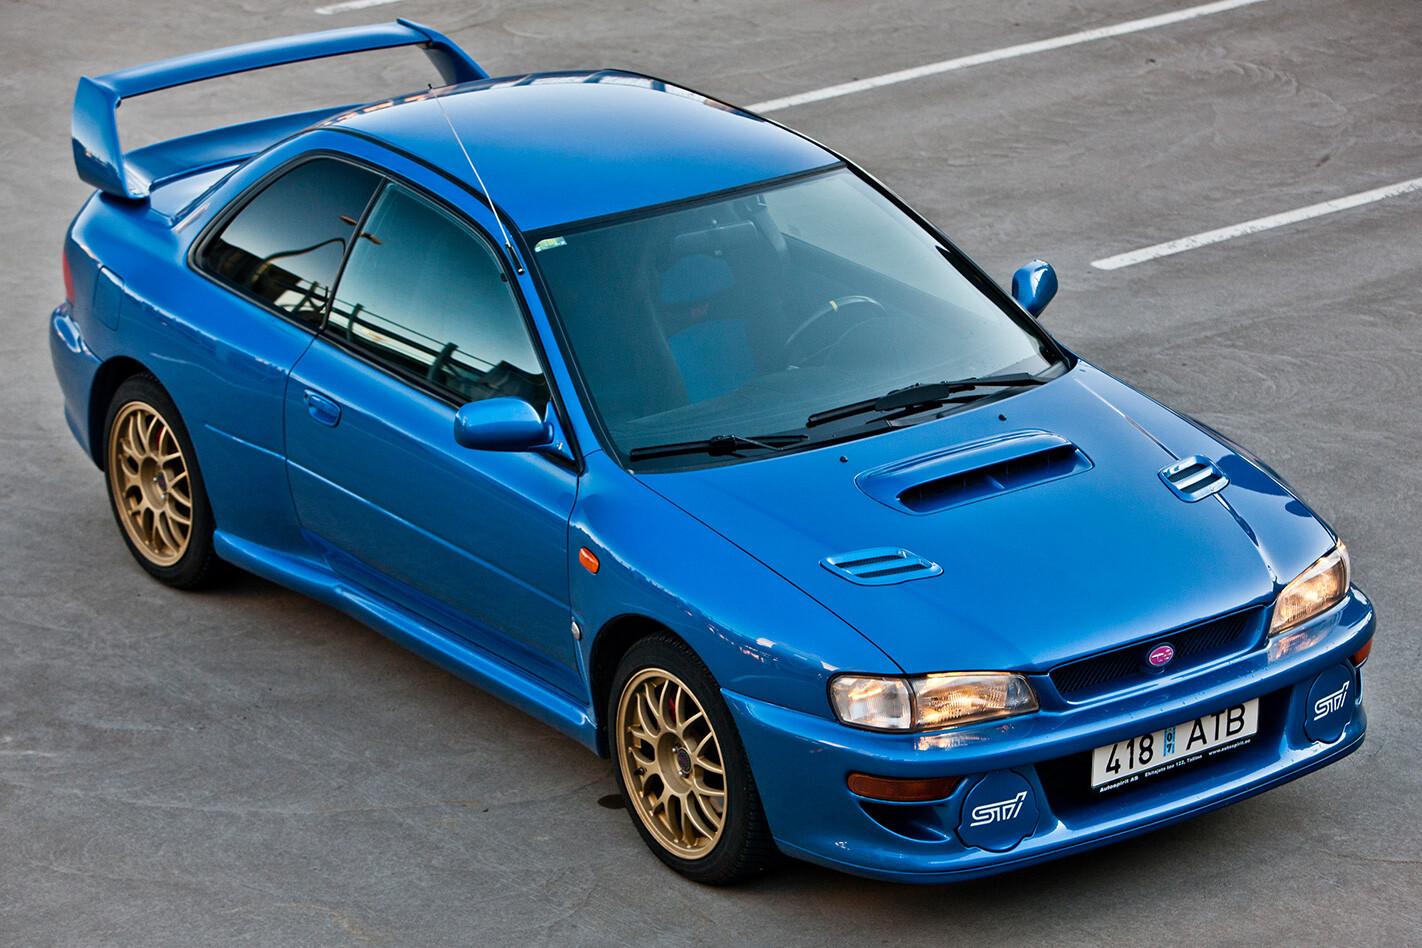 Subaru Impreza Wrx Sti 22 B Top Down Jpg